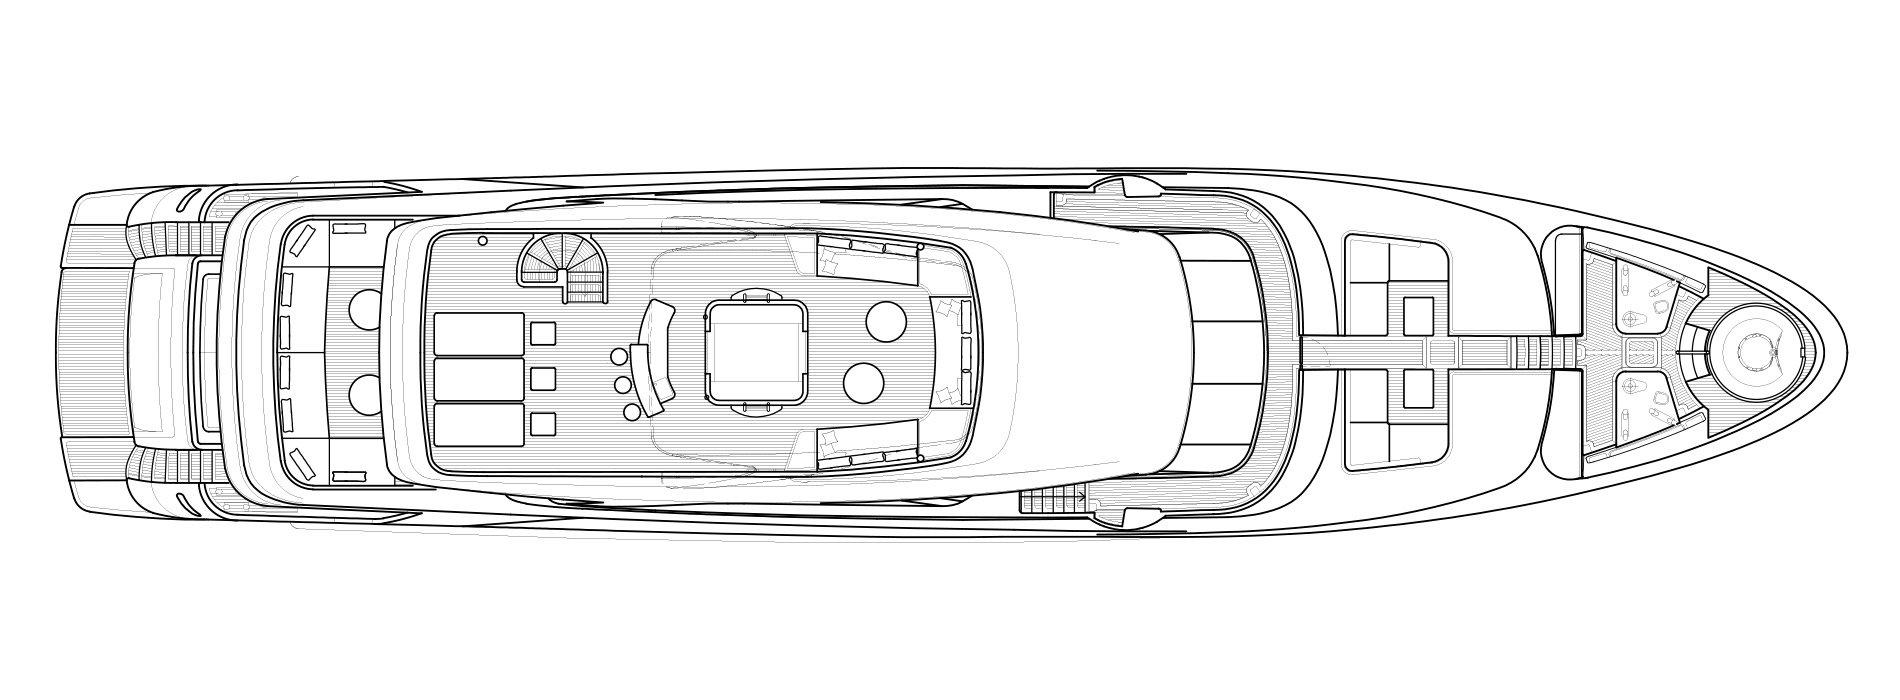 Sanlorenzo Yachts SD126 飞桥 Versione B